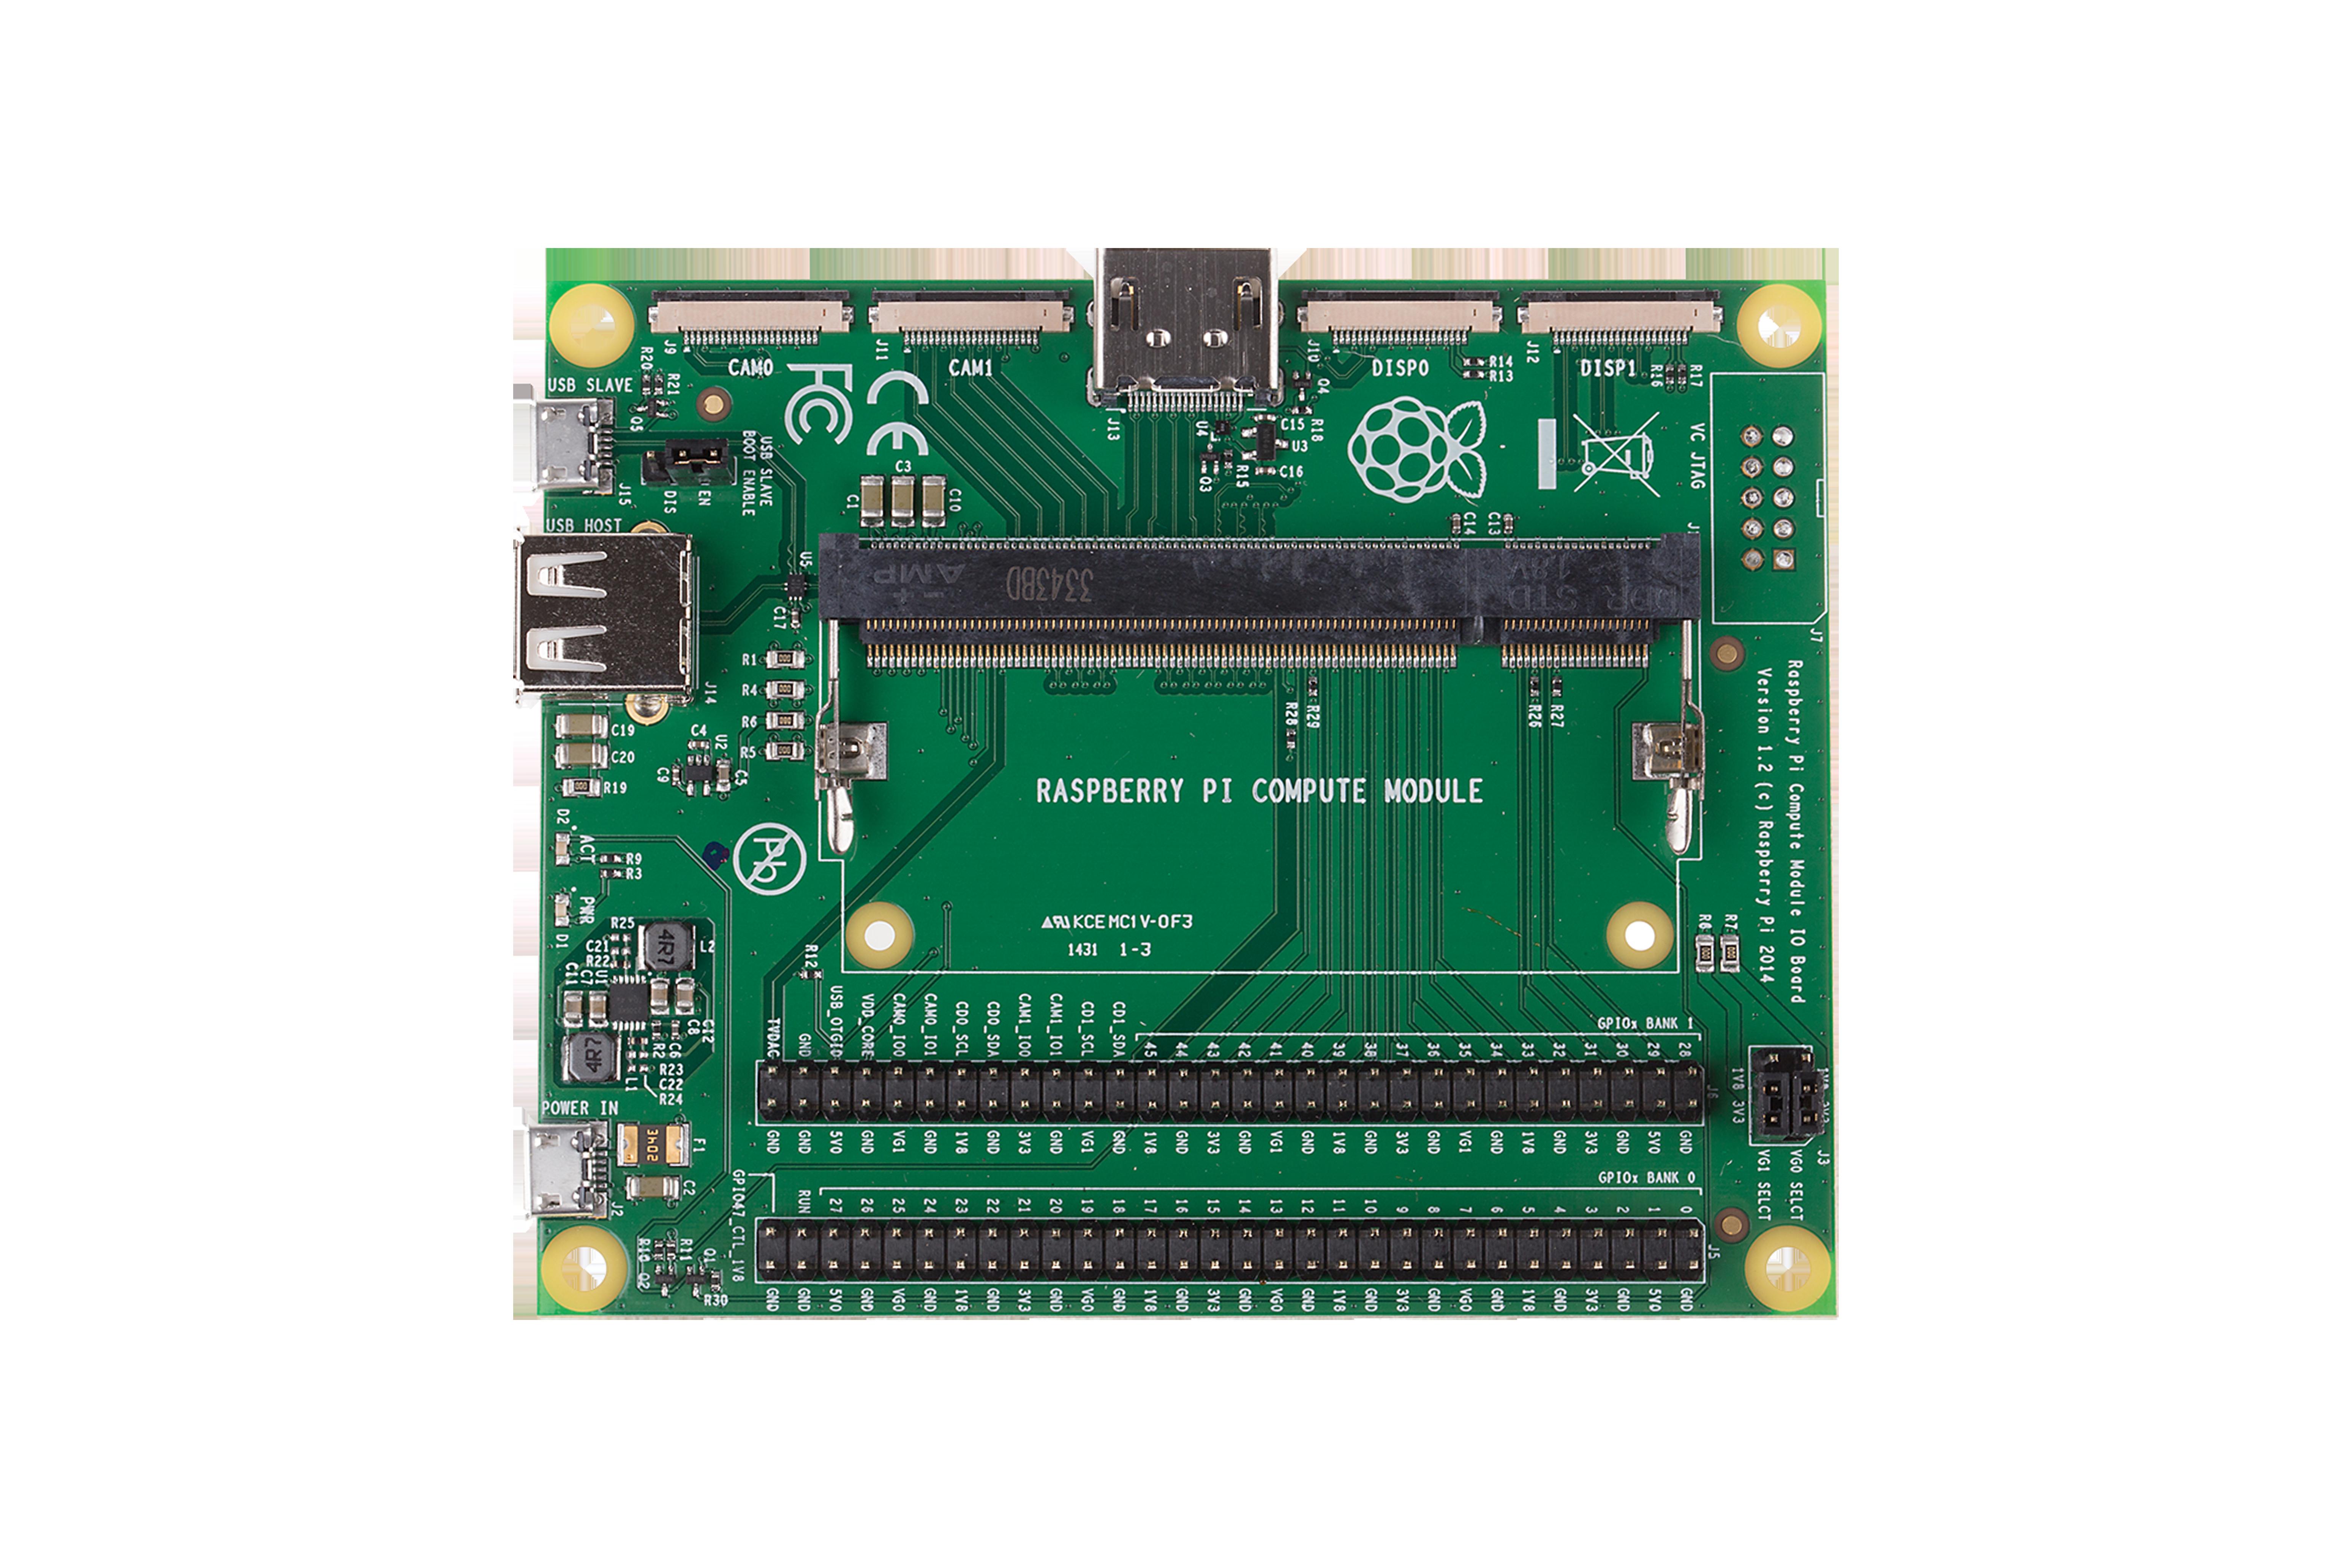 Raspberry Pi(ラズベリーパイ)コンピュートモジュール3 + 開発キット